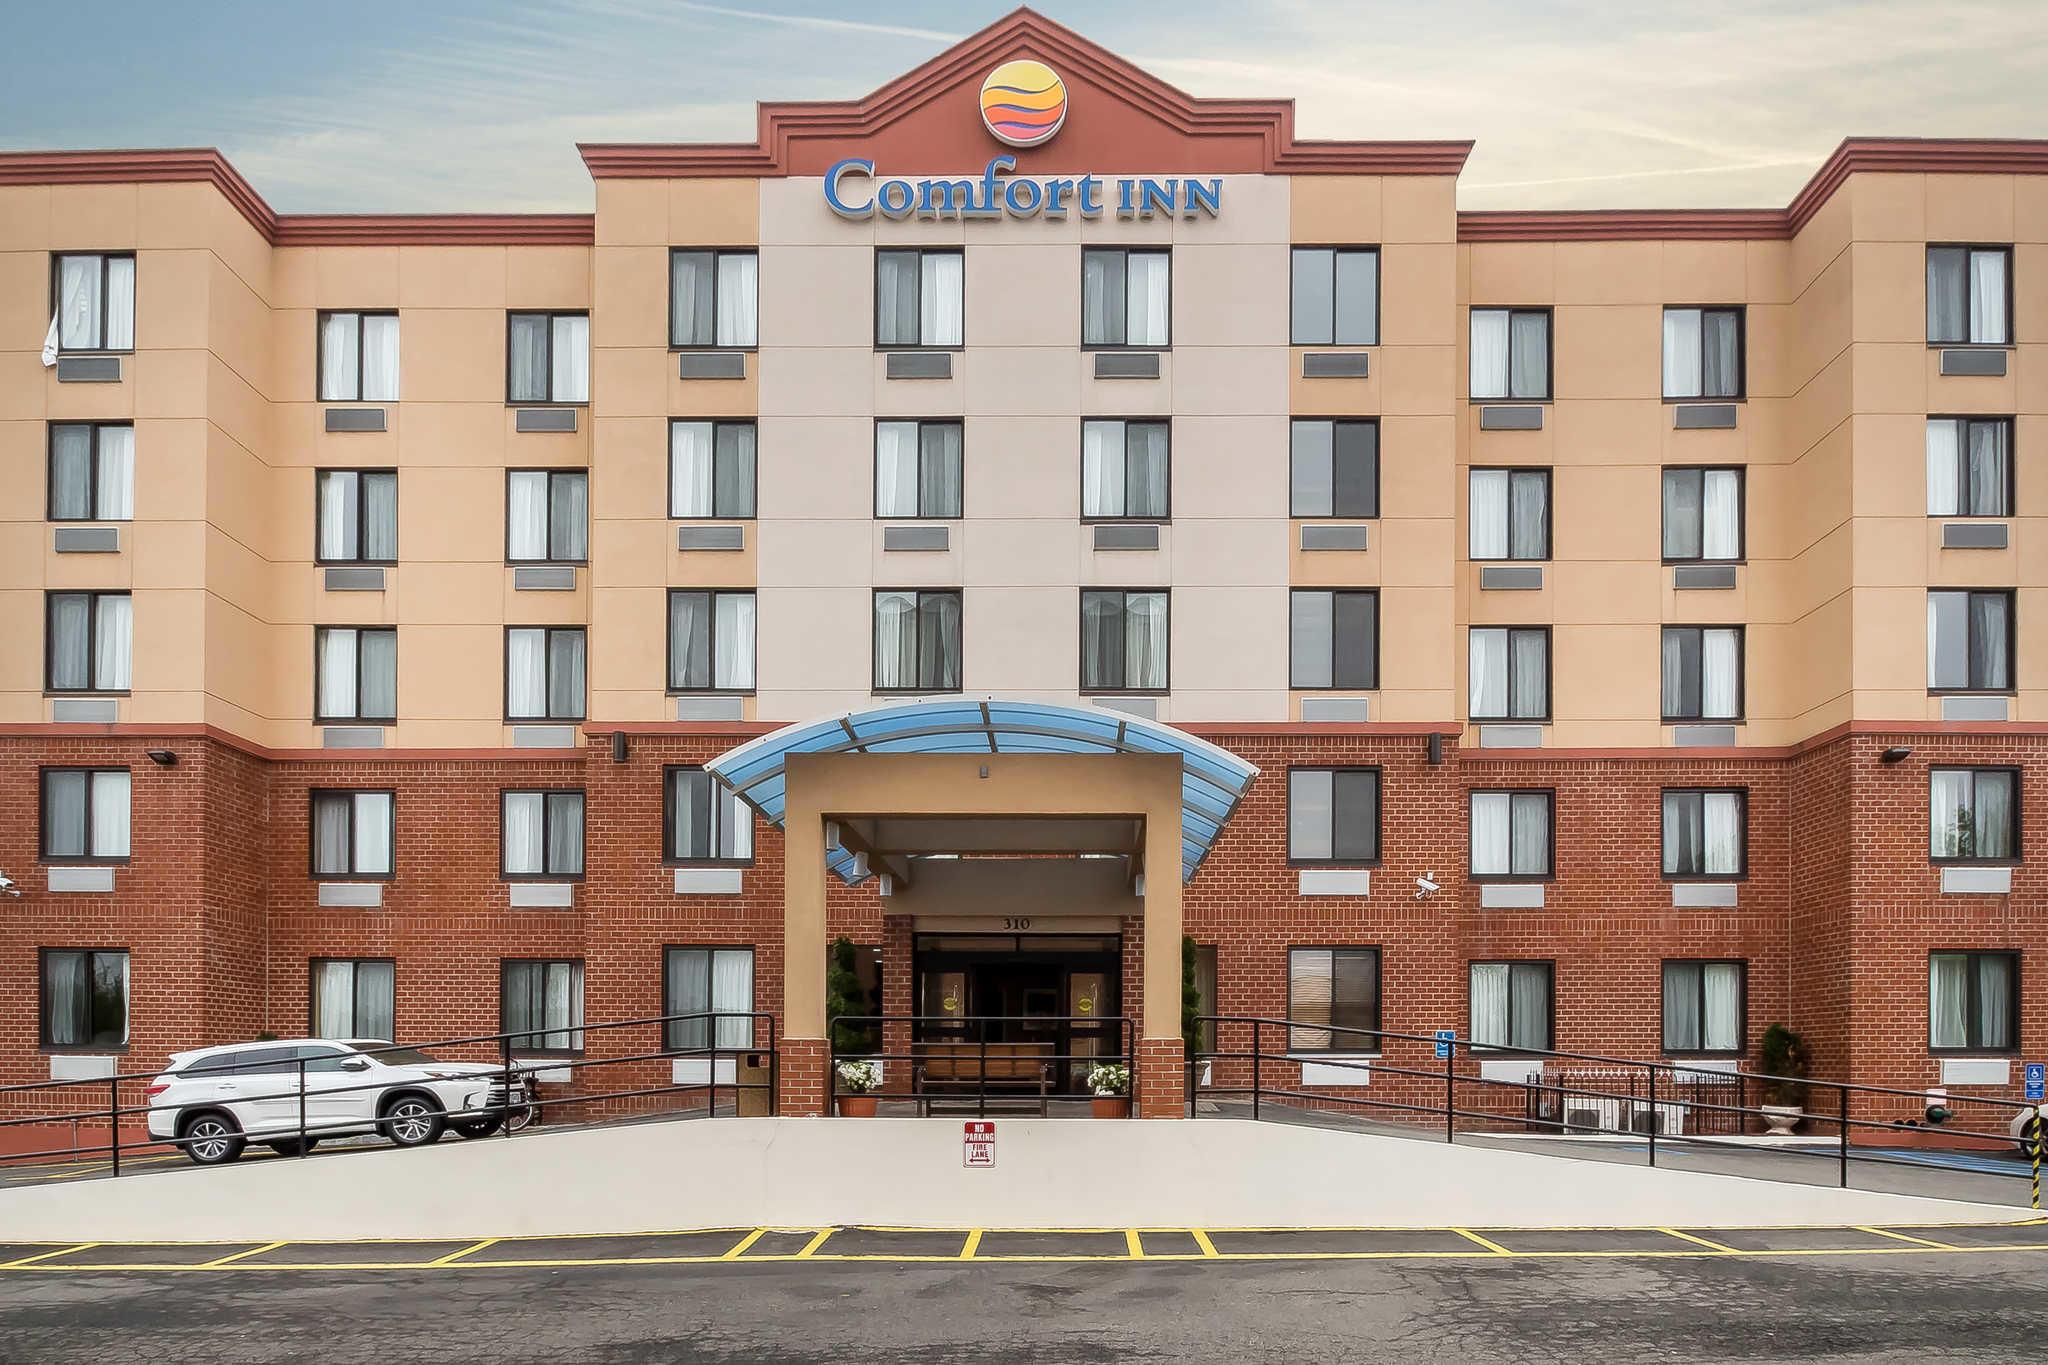 Comfort Inn Staten Island image 18